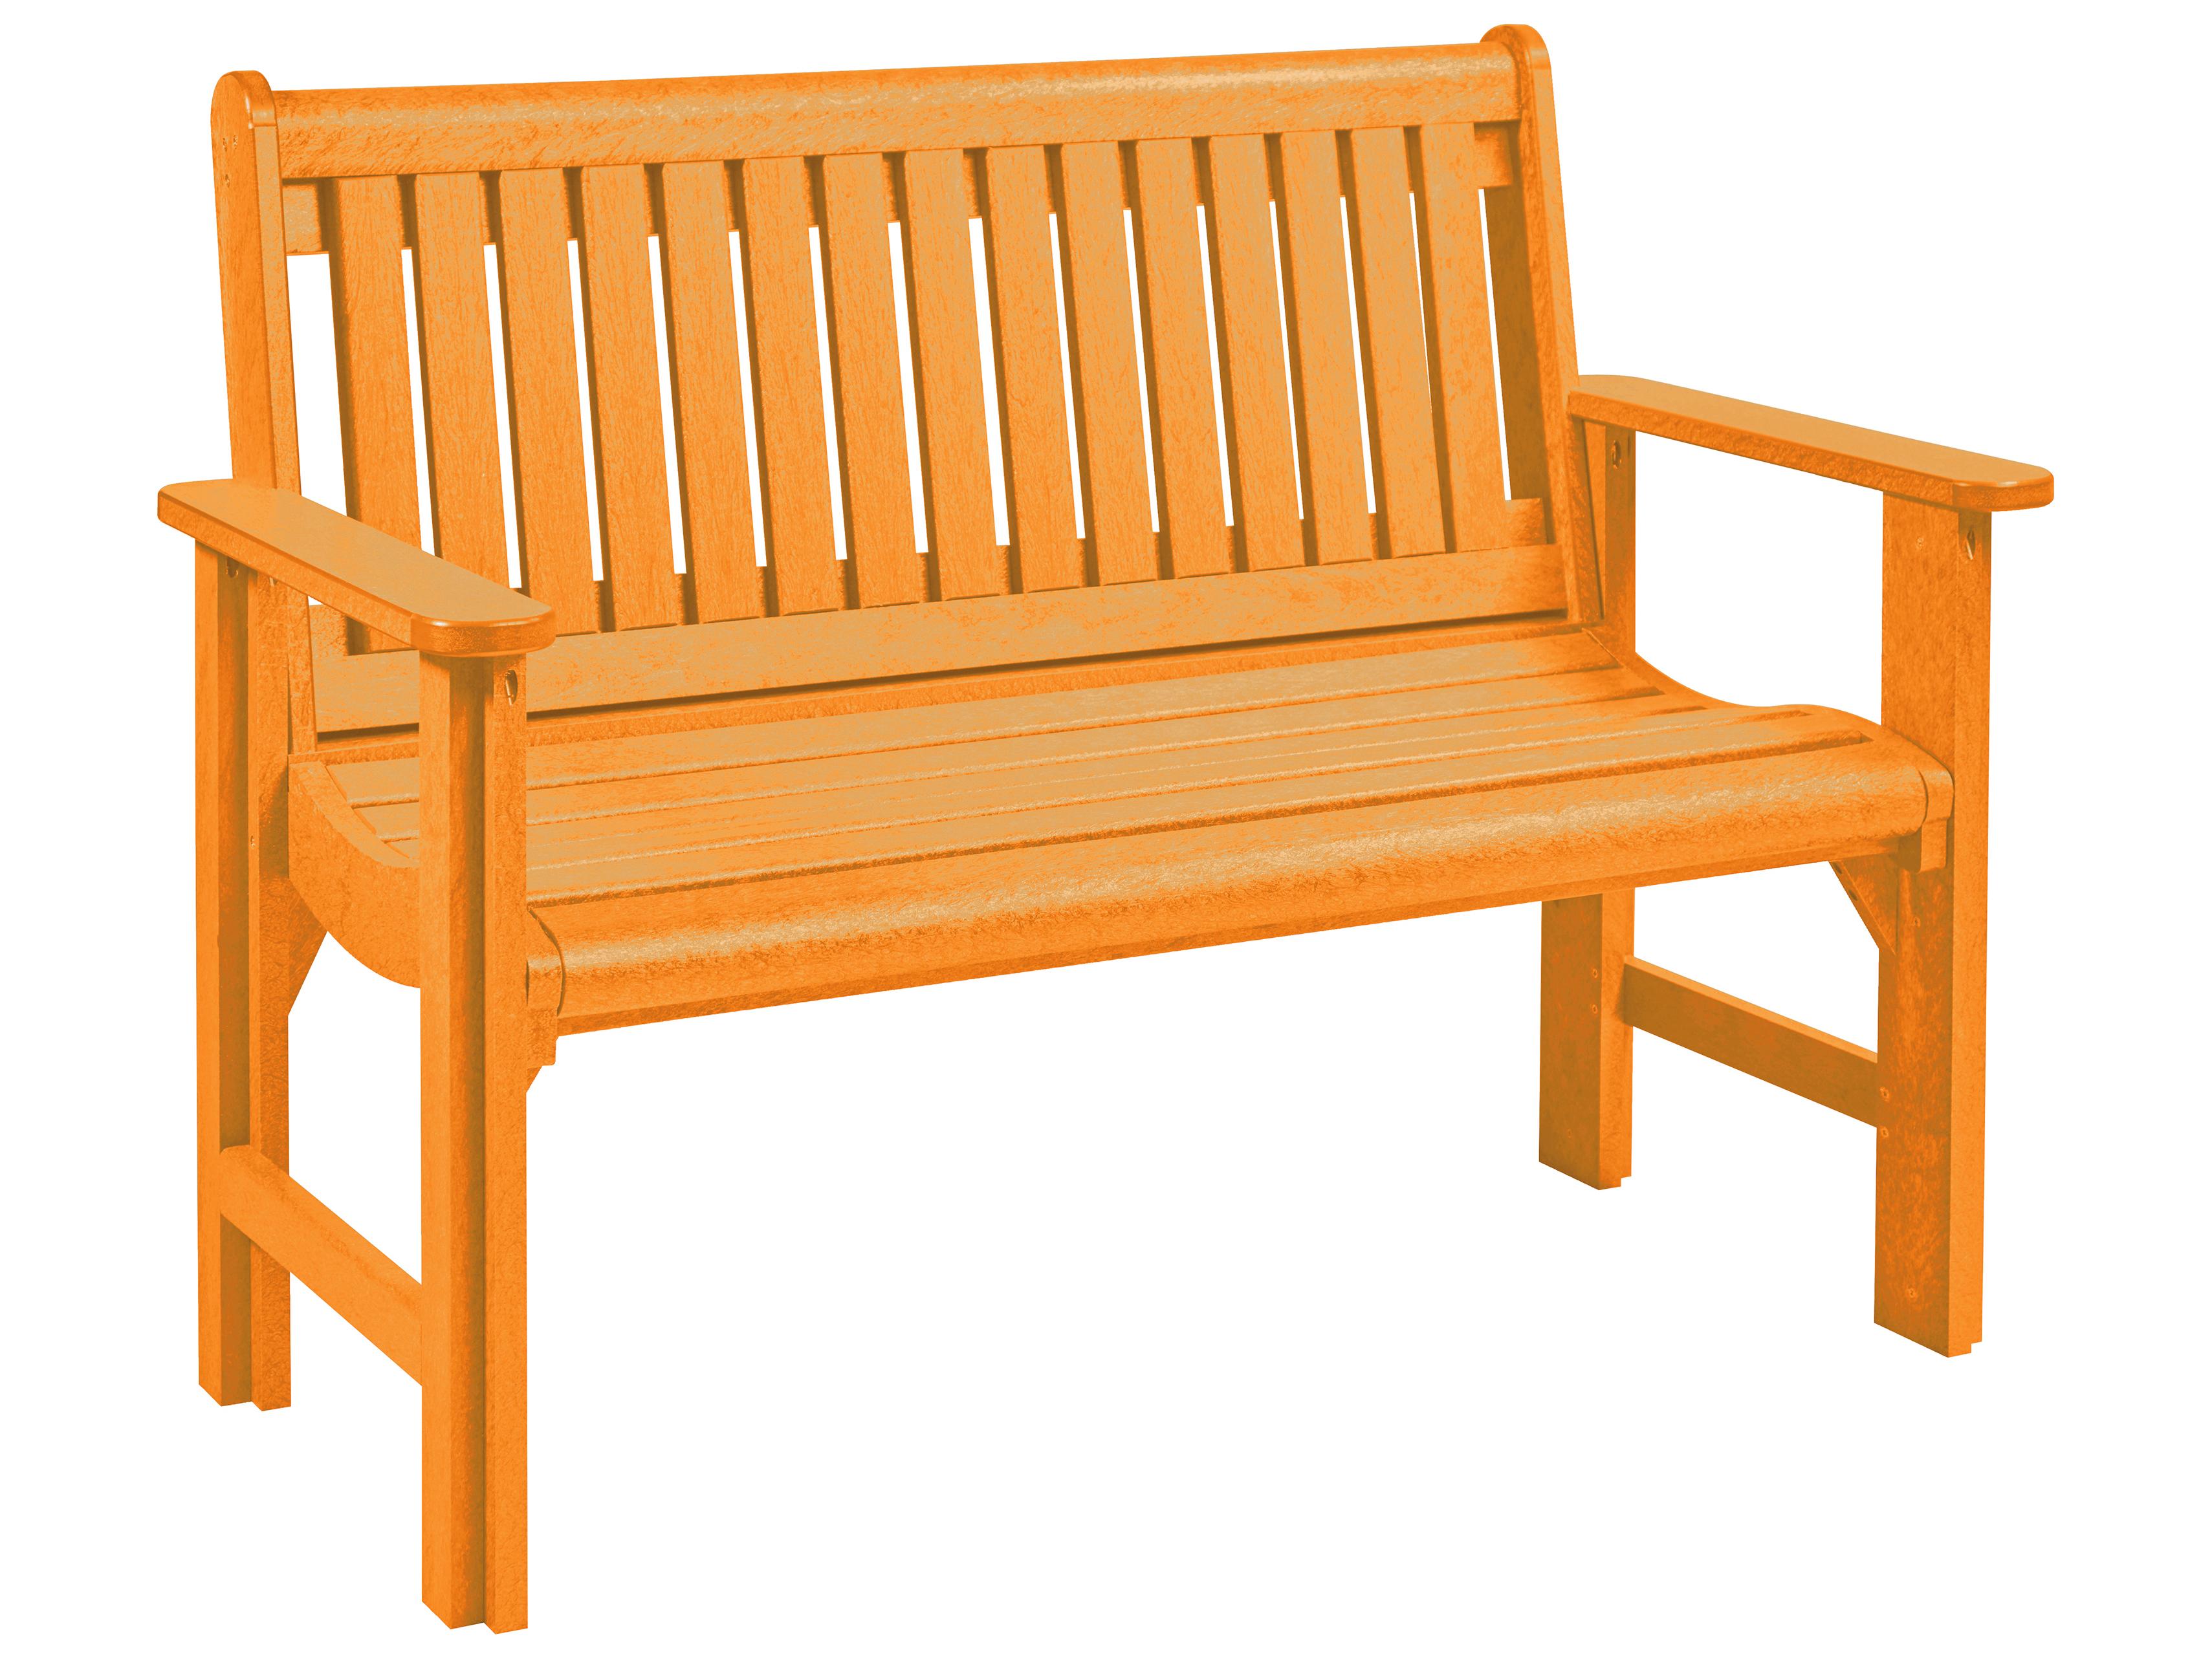 C R Plastic Generation Garden Bench Crb01